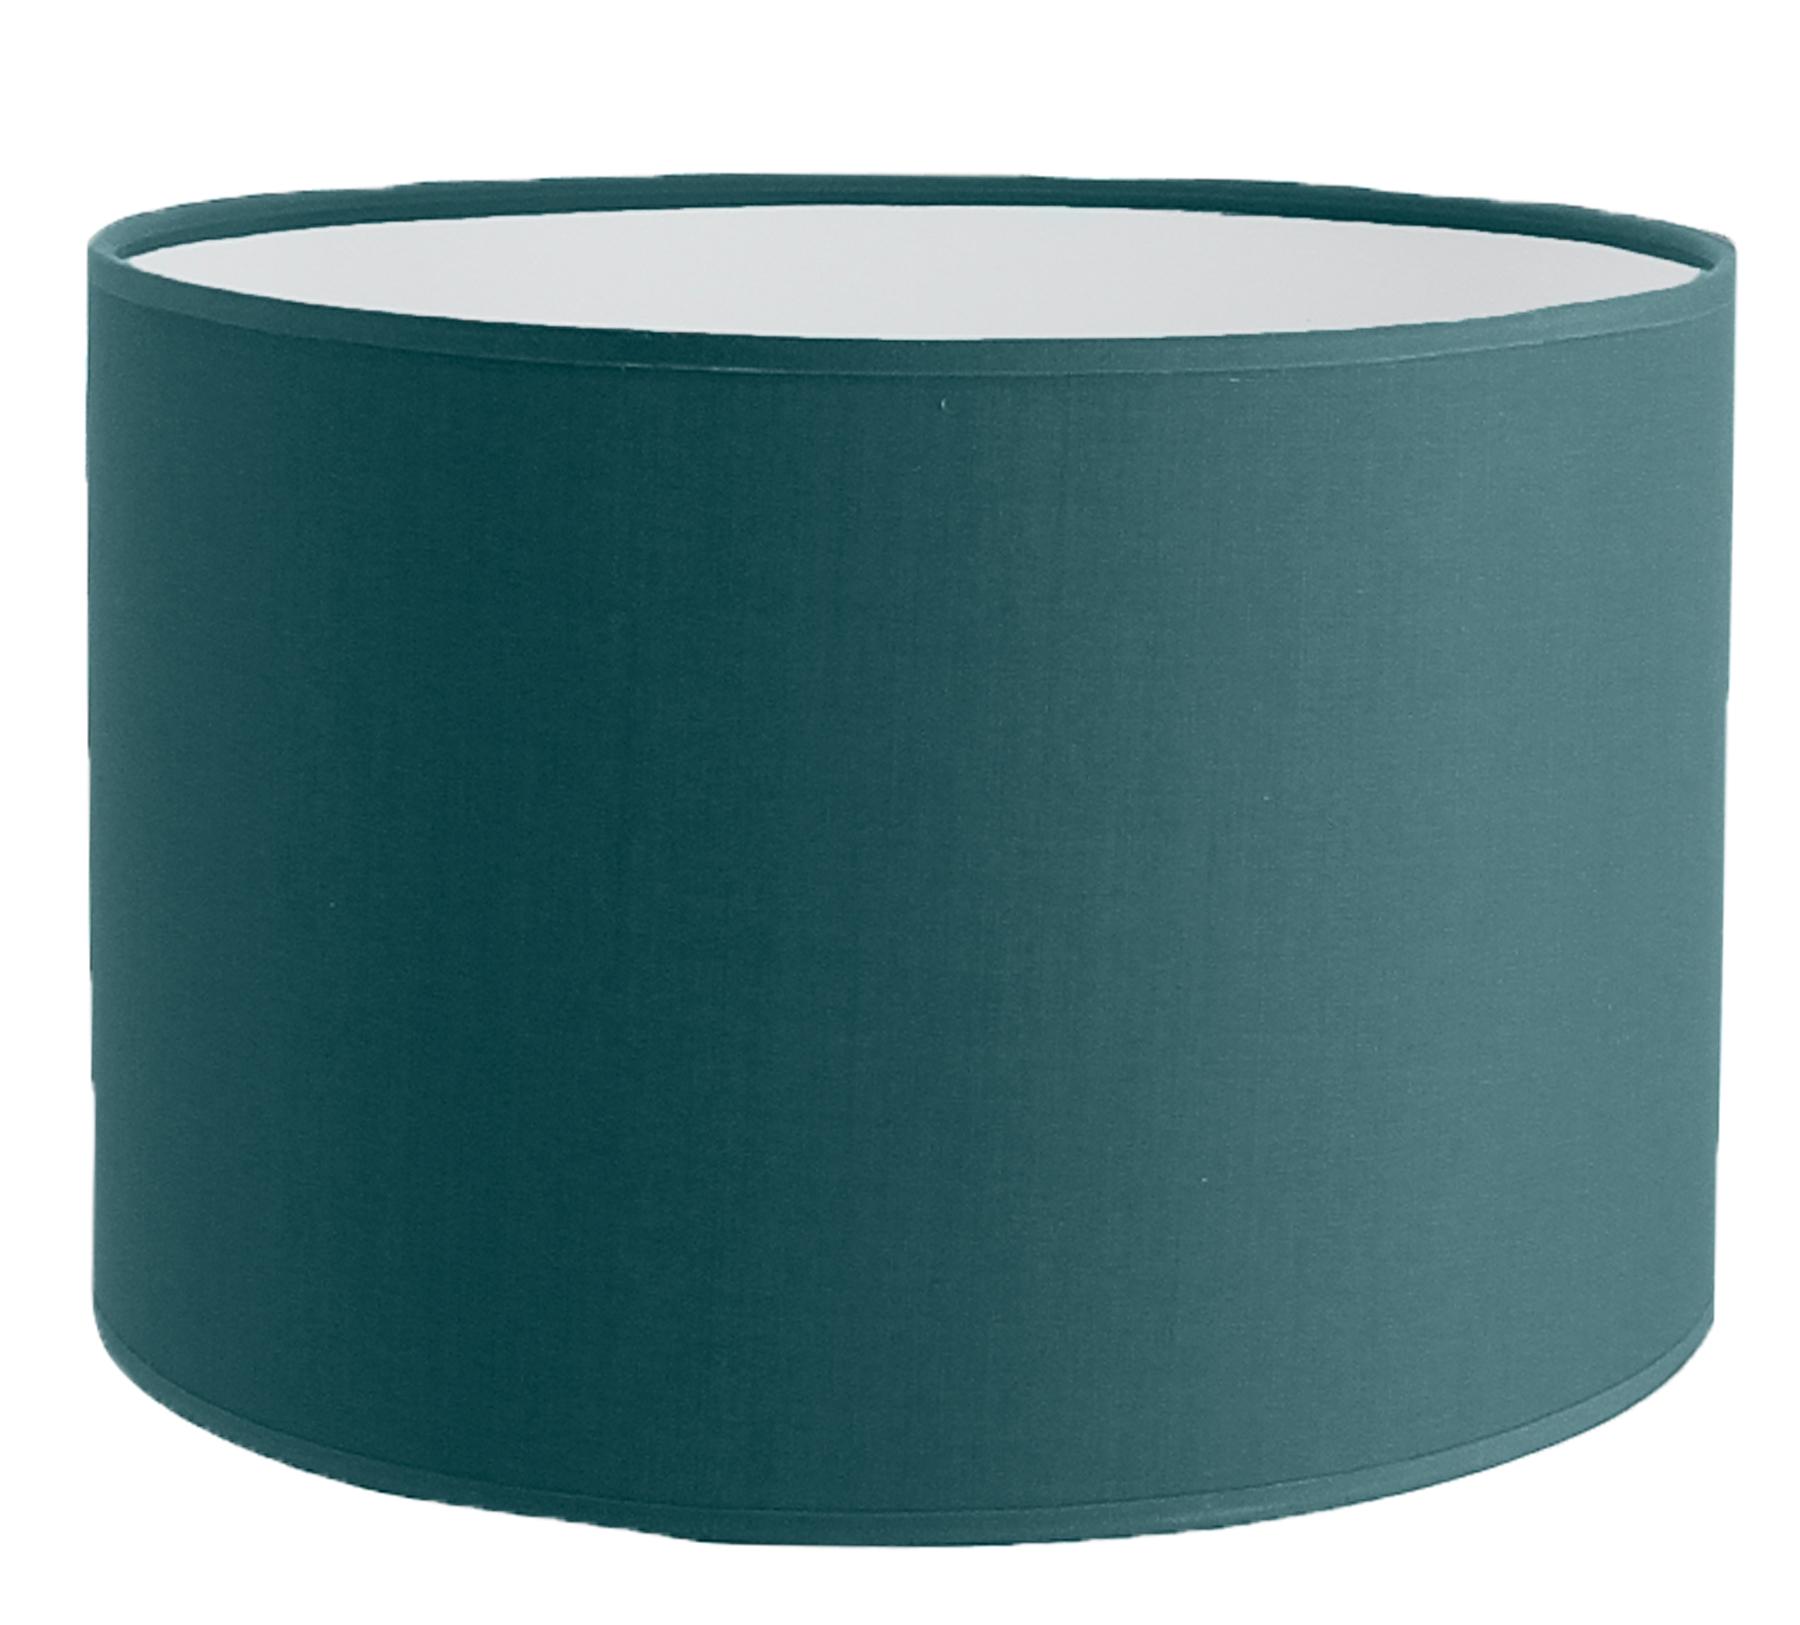 Abat-jour cylindre bleu canard